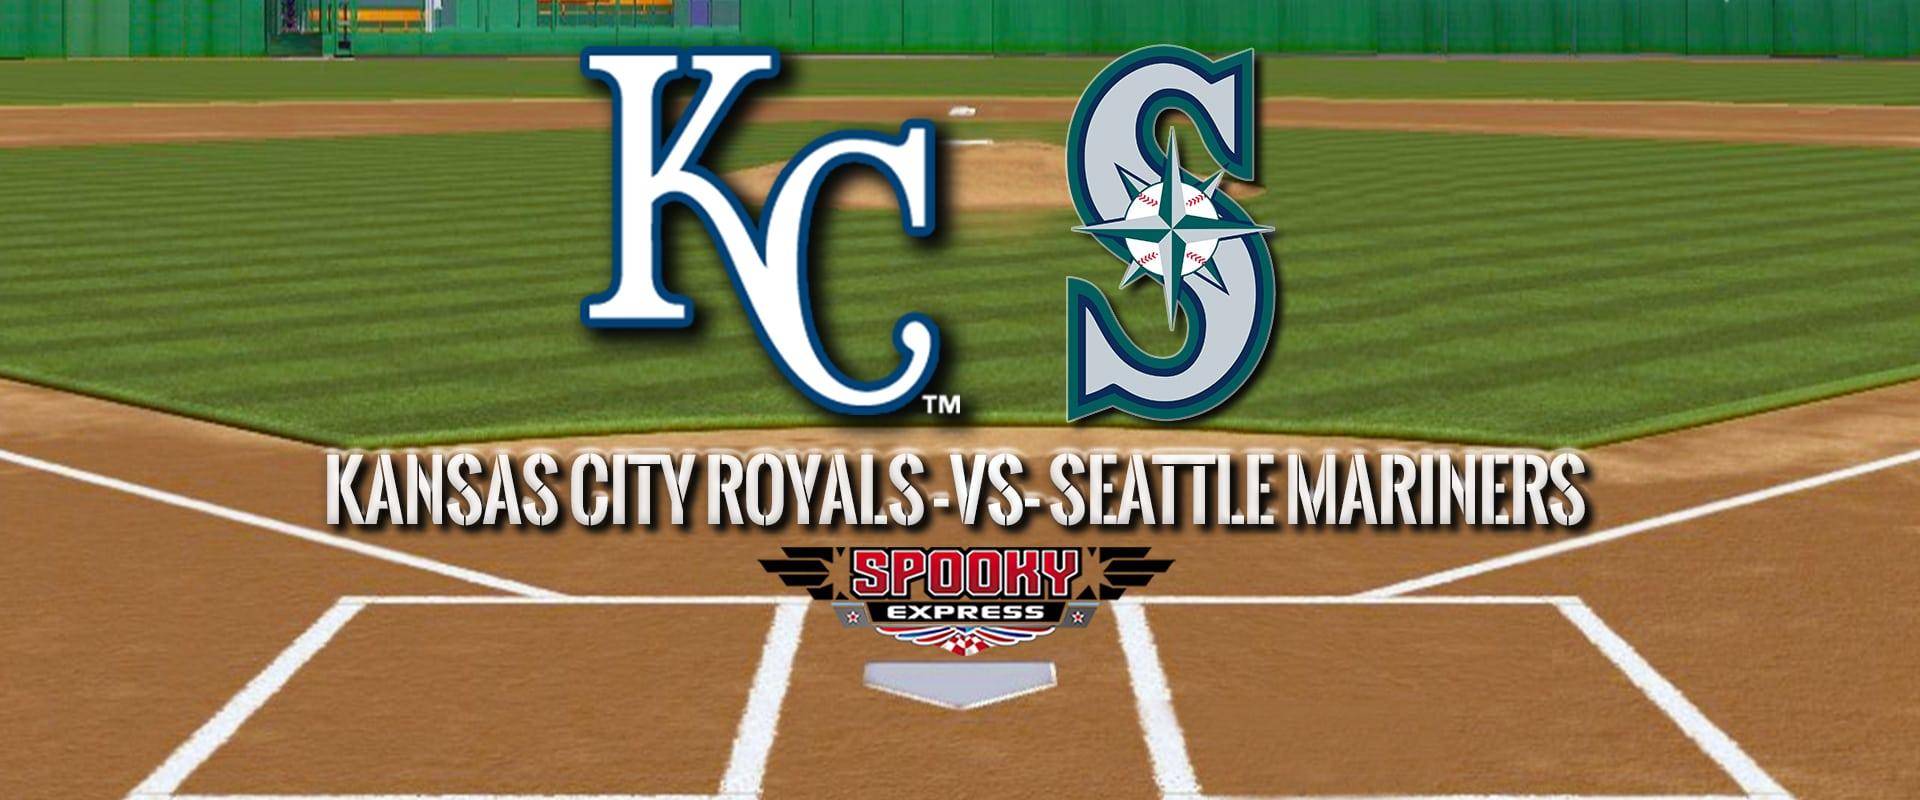 0b20dde5727 MLB Betting Preview  Seattle Mariners vs. Kansas City Royals - July ...